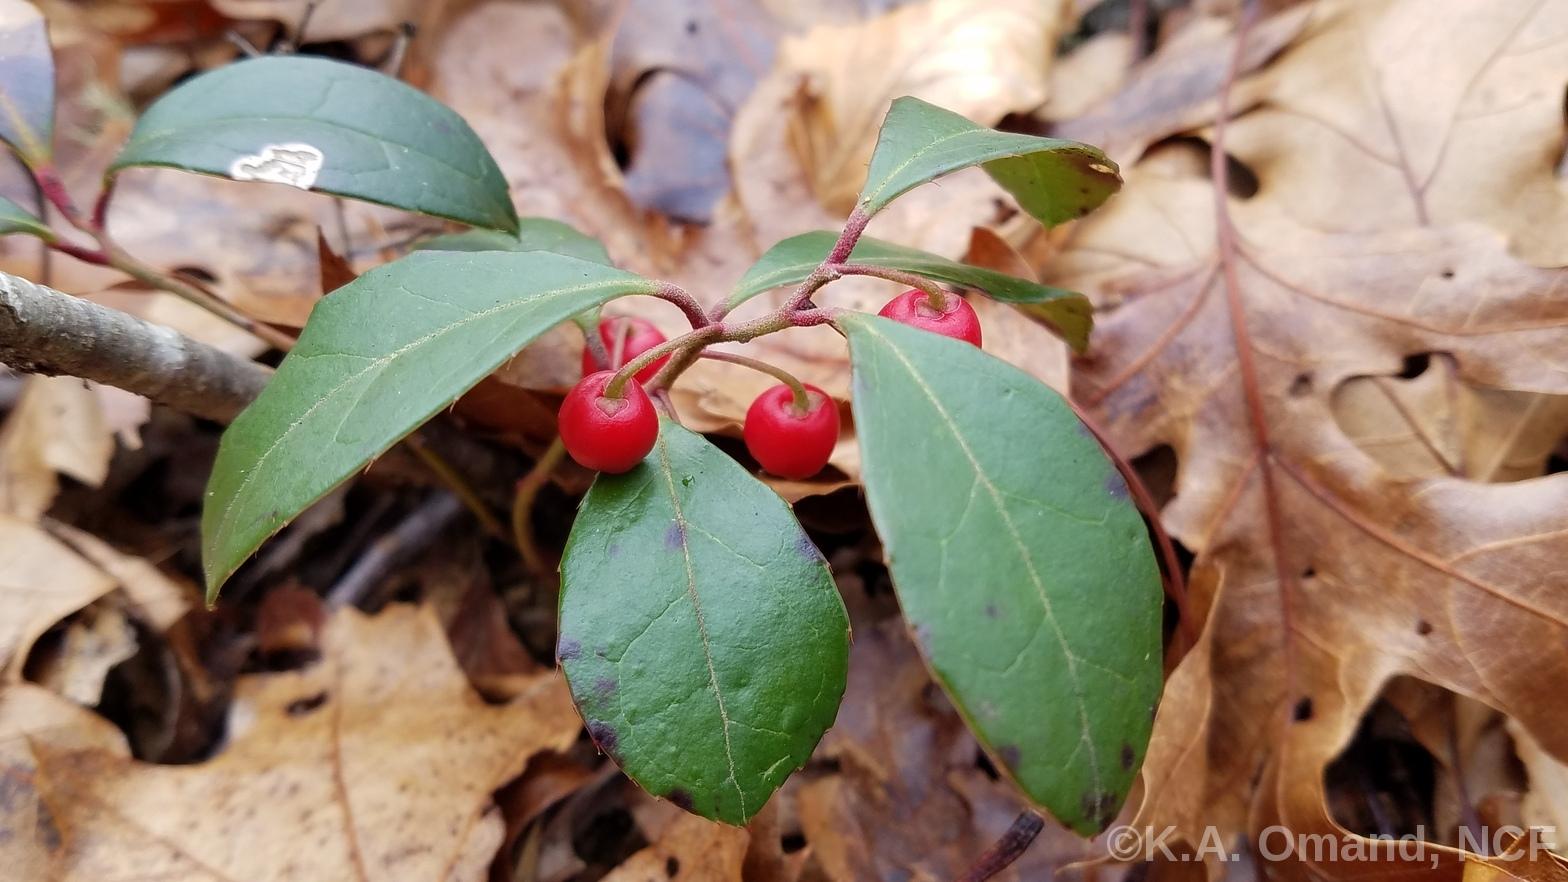 winterberrywbarnstable,kaoc